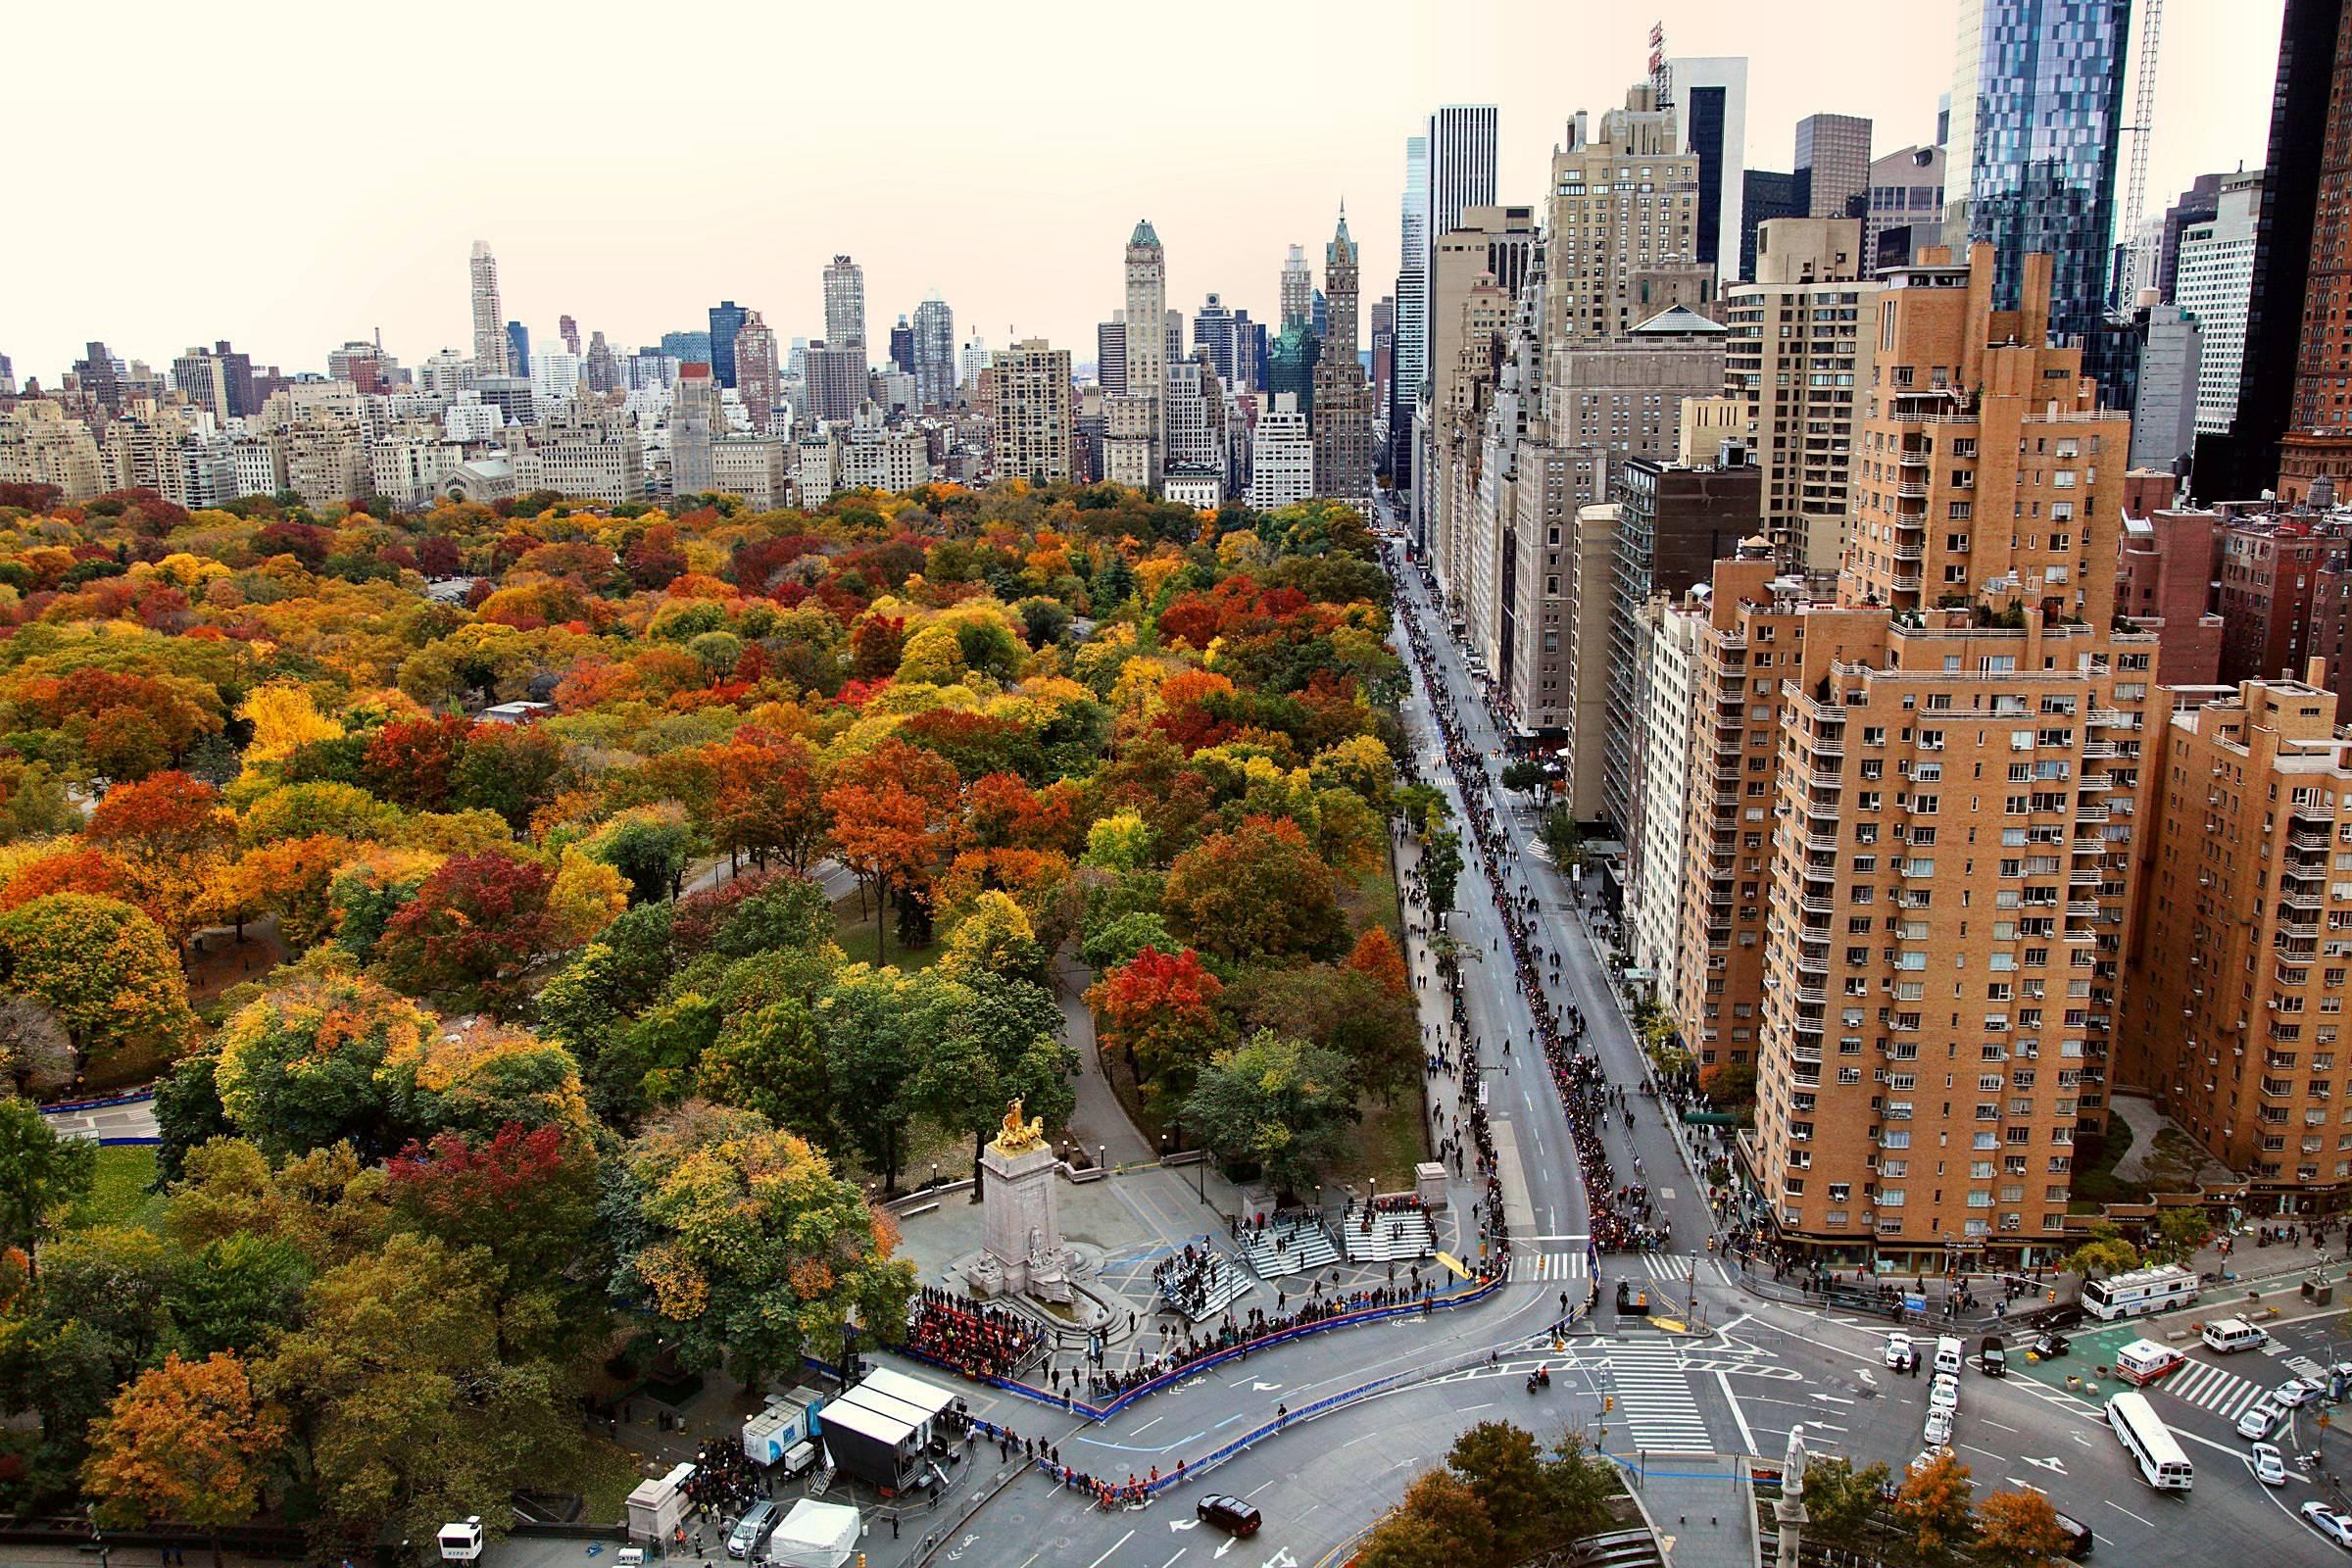 Central Park Fall Wallpaper - WallpaperSafari |Autumn Central Park Screensavers